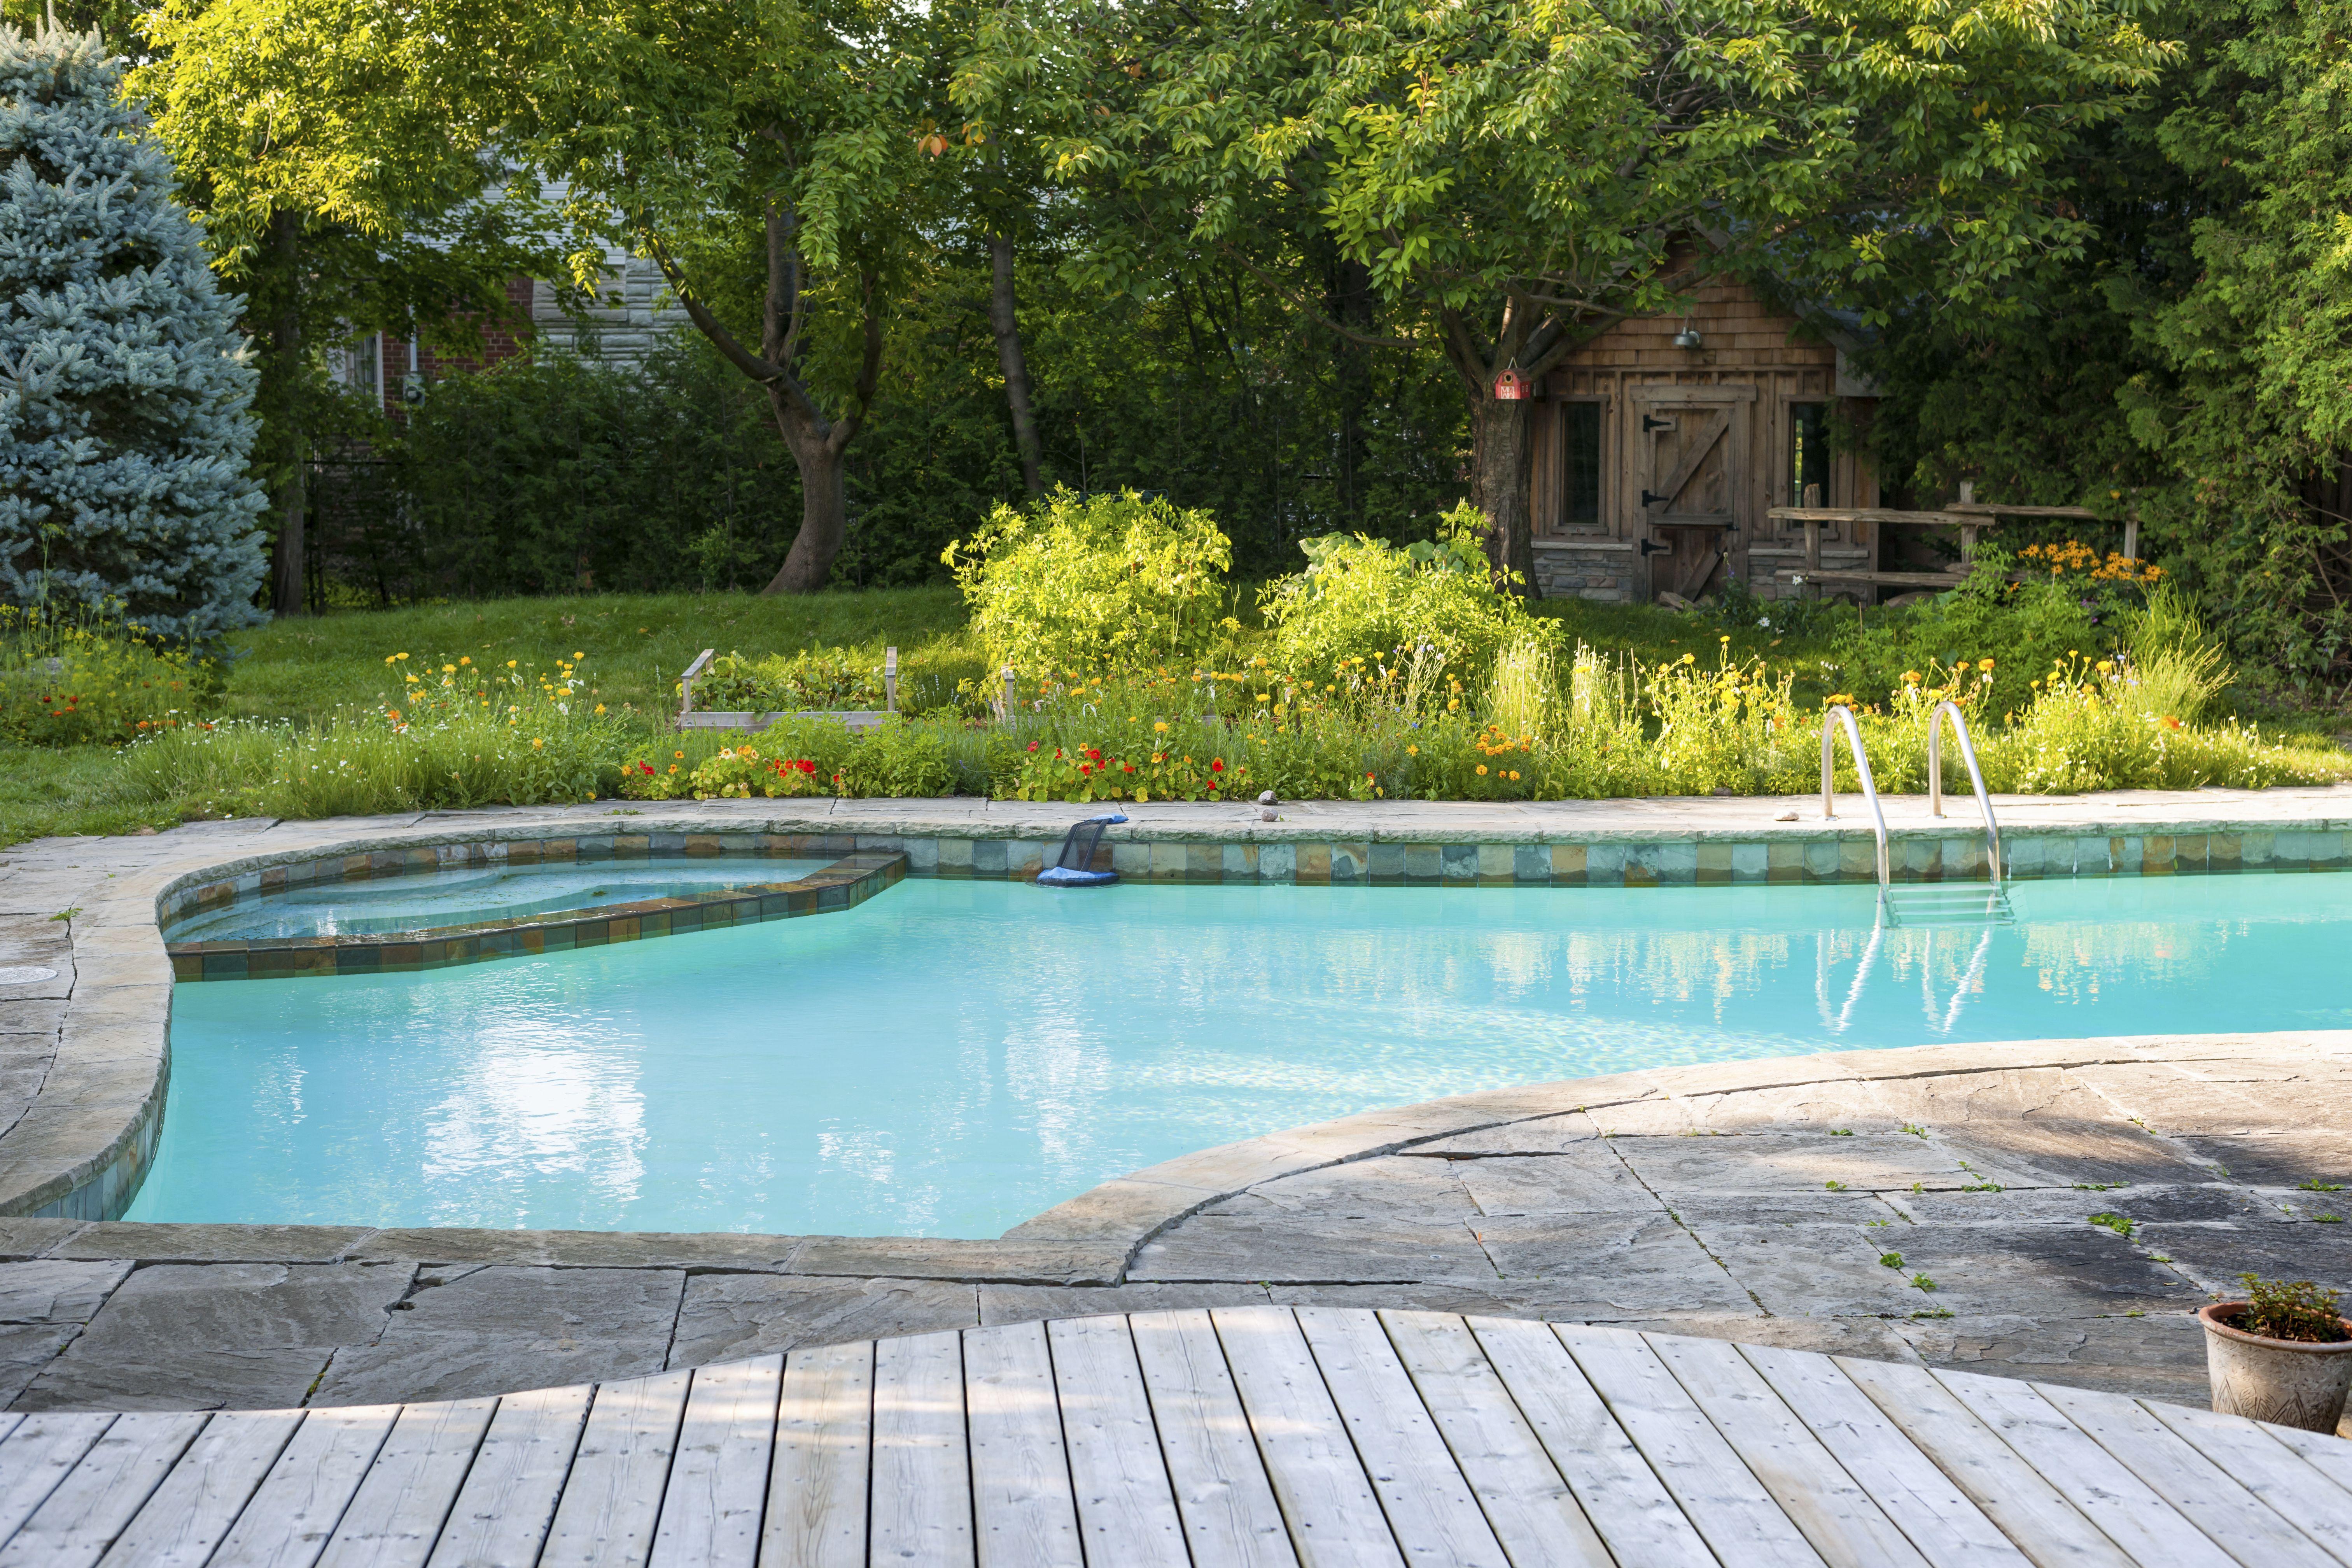 Mantenimiento de piscinas en Calvía